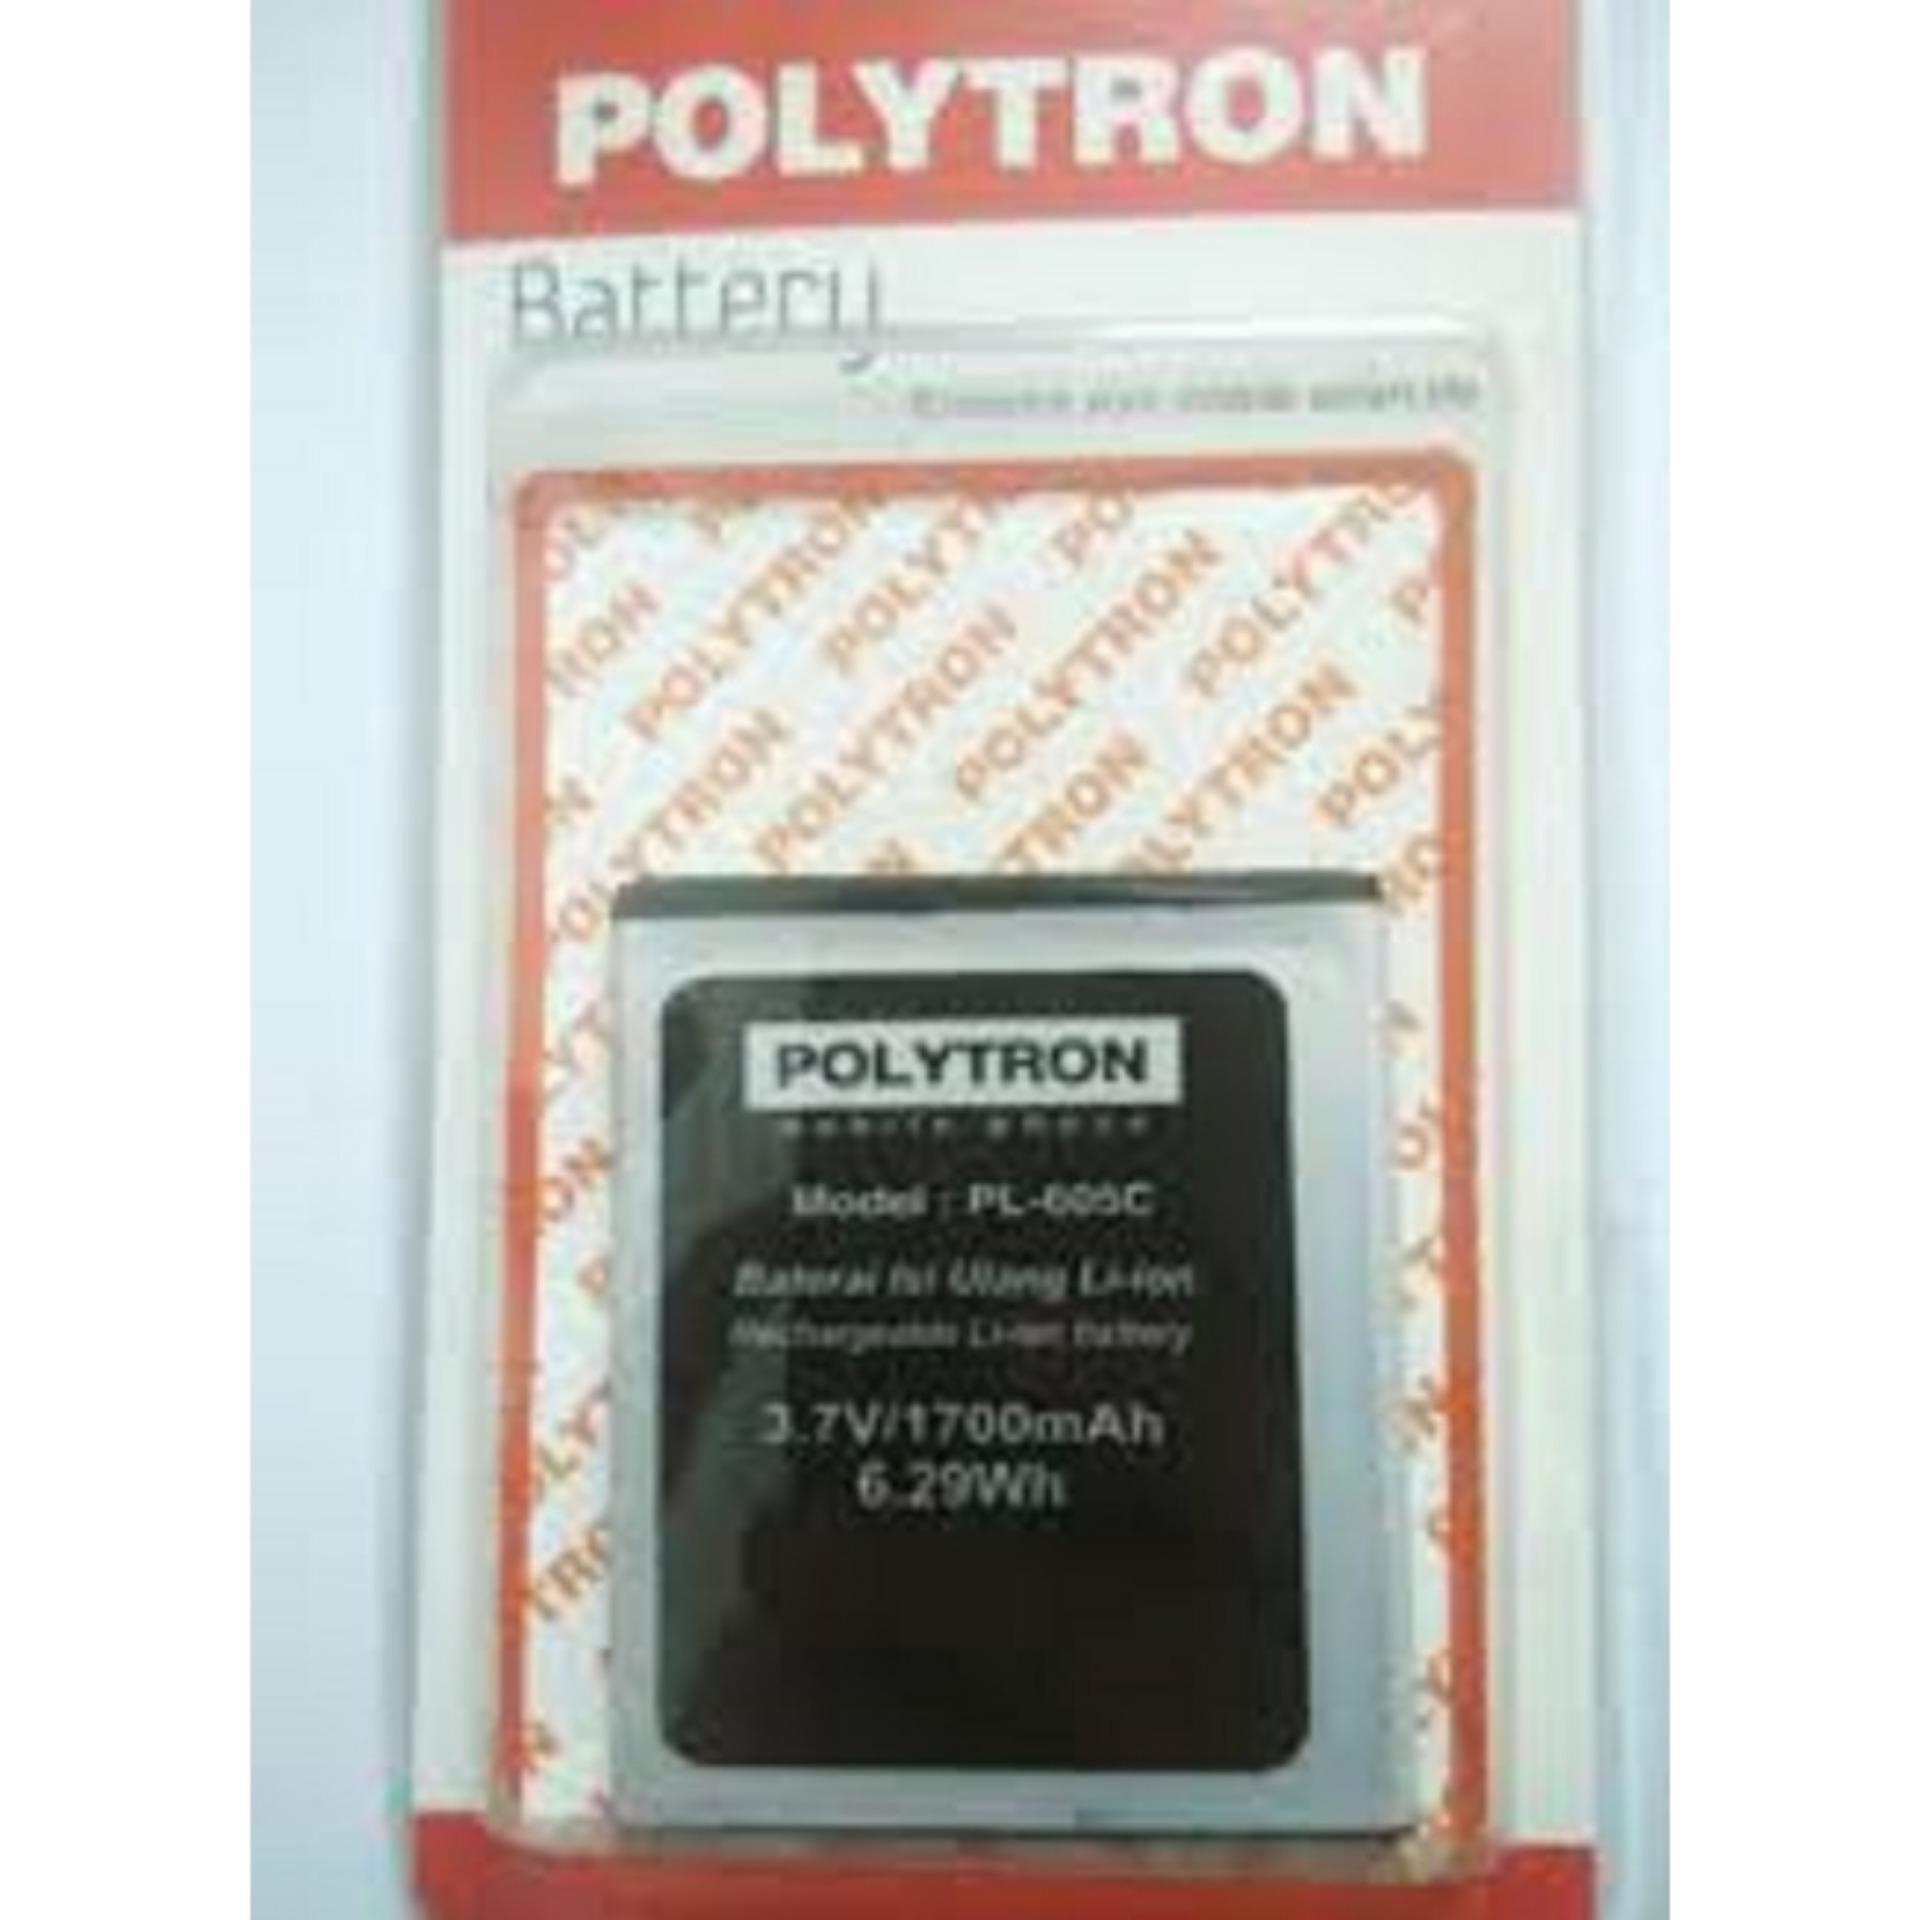 Buy Sell Cheapest Original Baterai Polytron Best Quality Product W1400 Android Battery Batre Rocket Ping Q2352 Pl 605c Pl605c